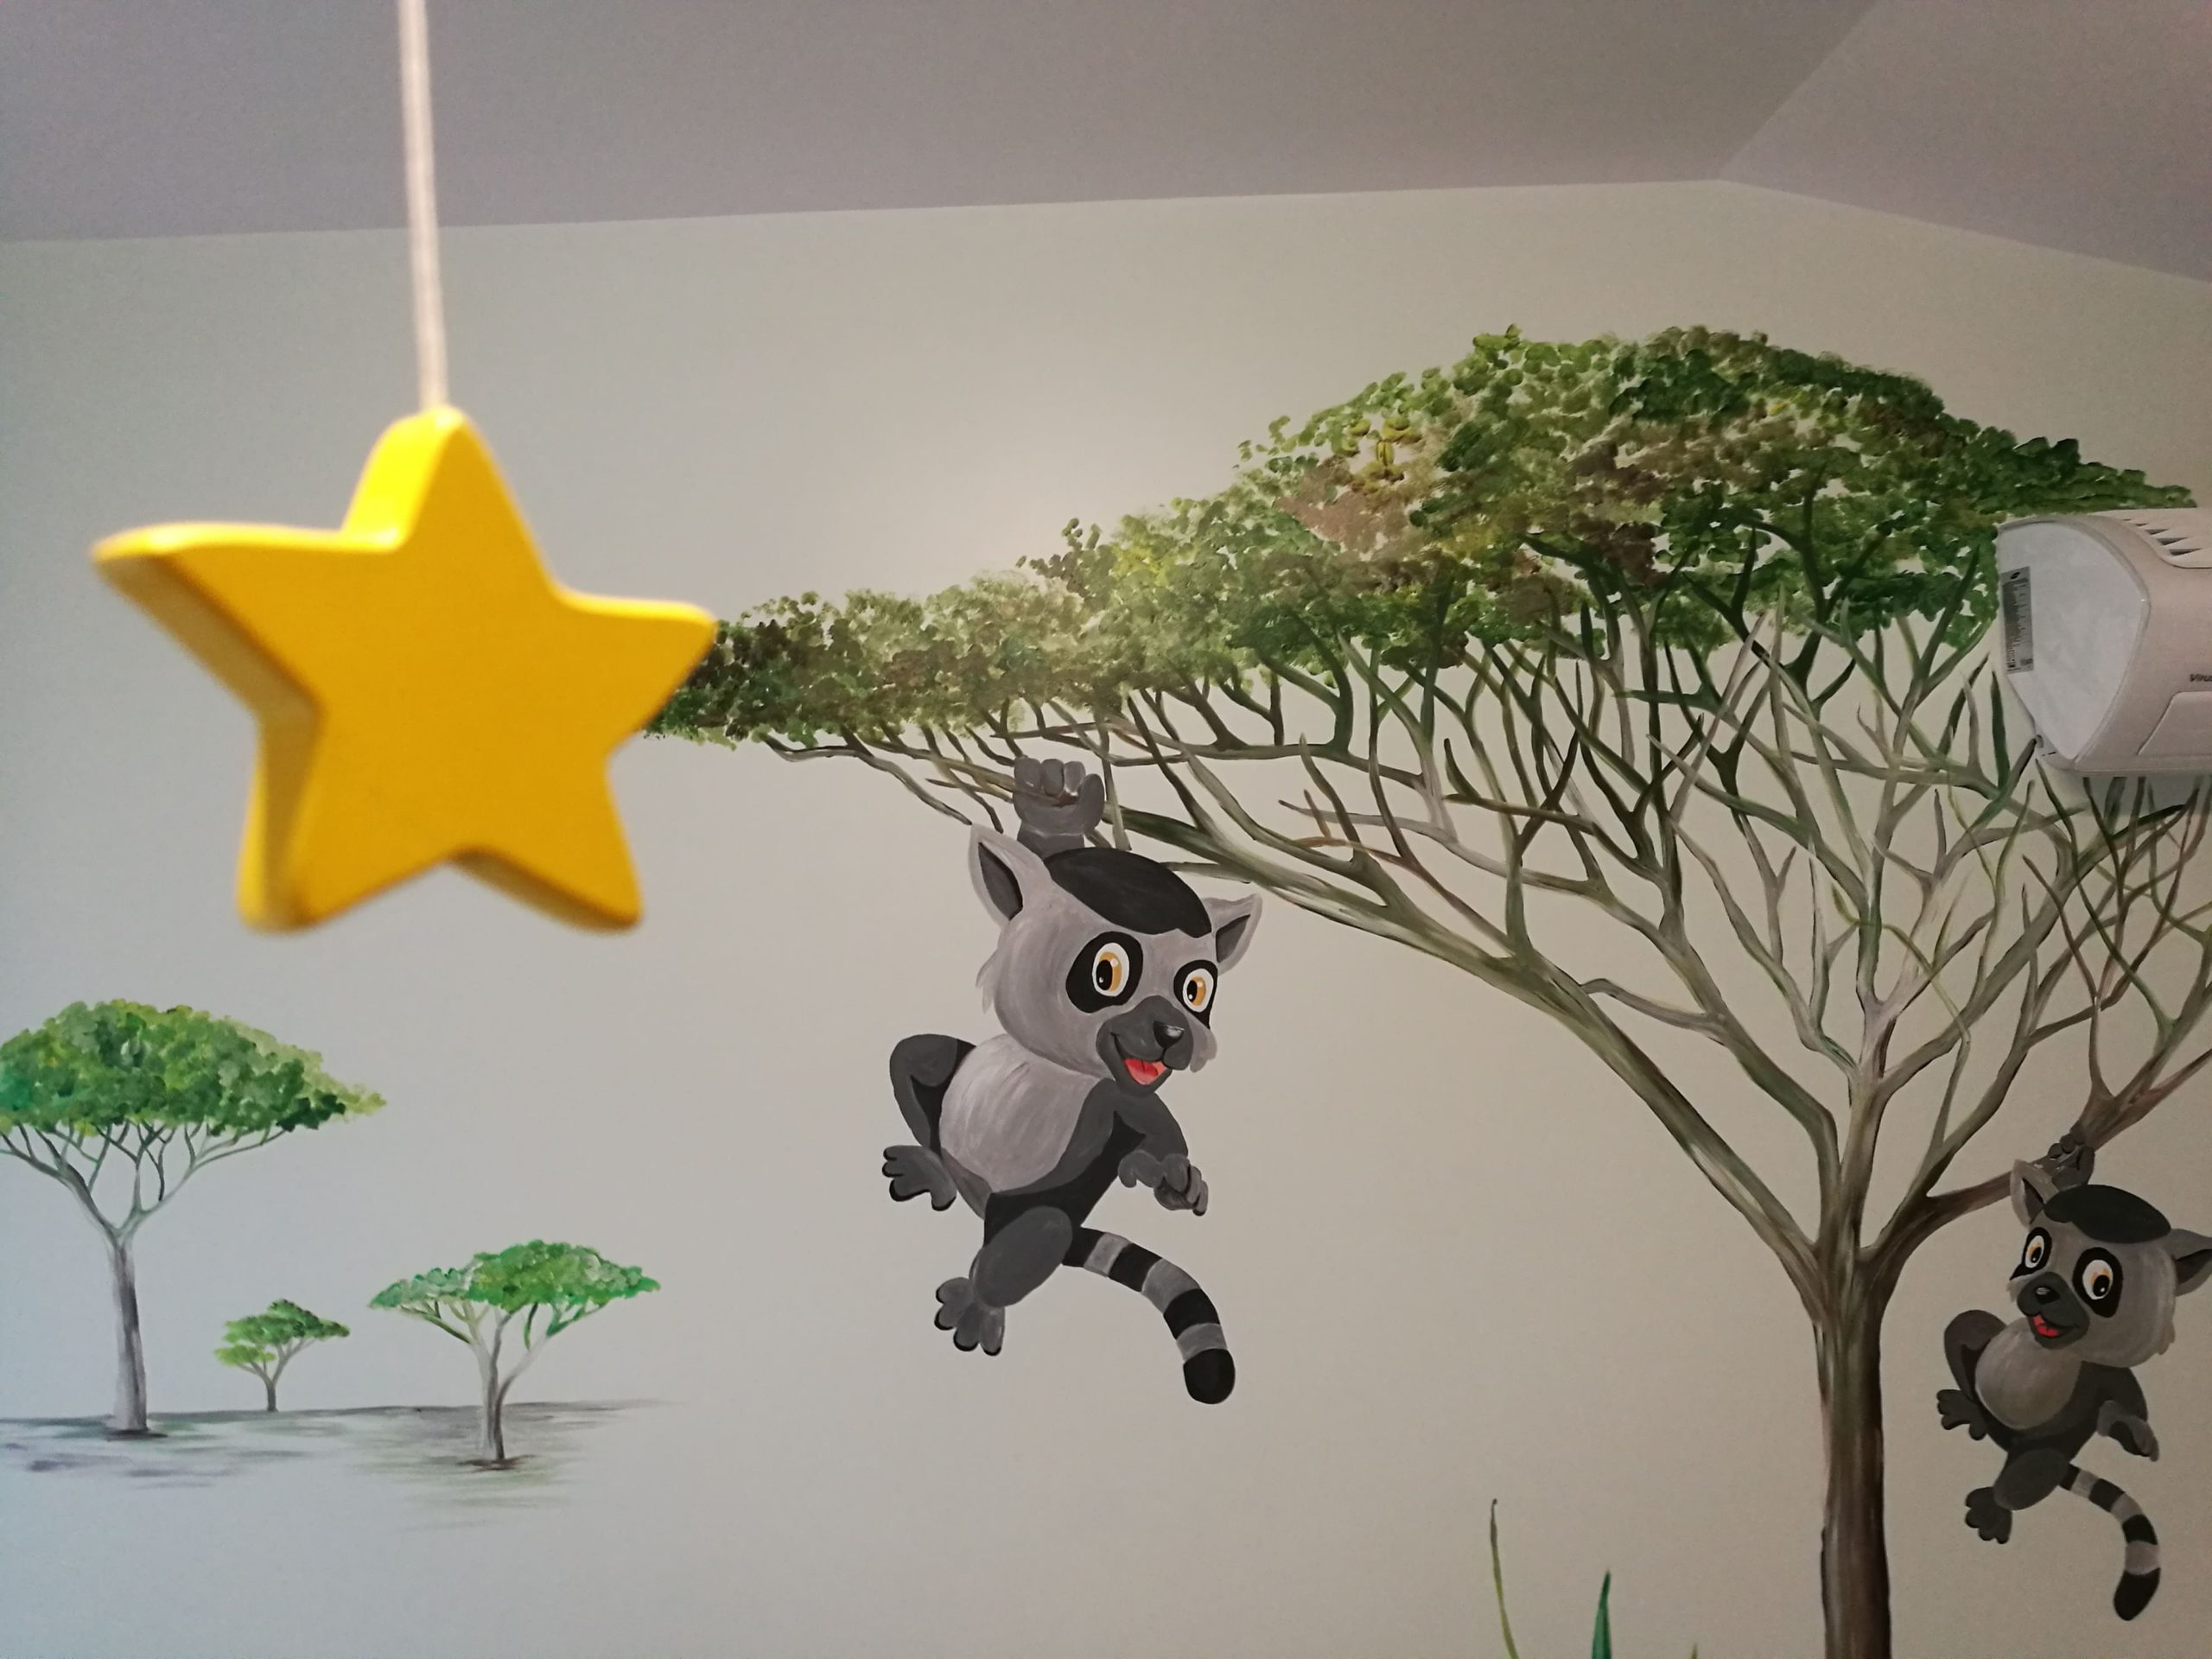 menine-kuryba-sienu-dekoravimas (27)